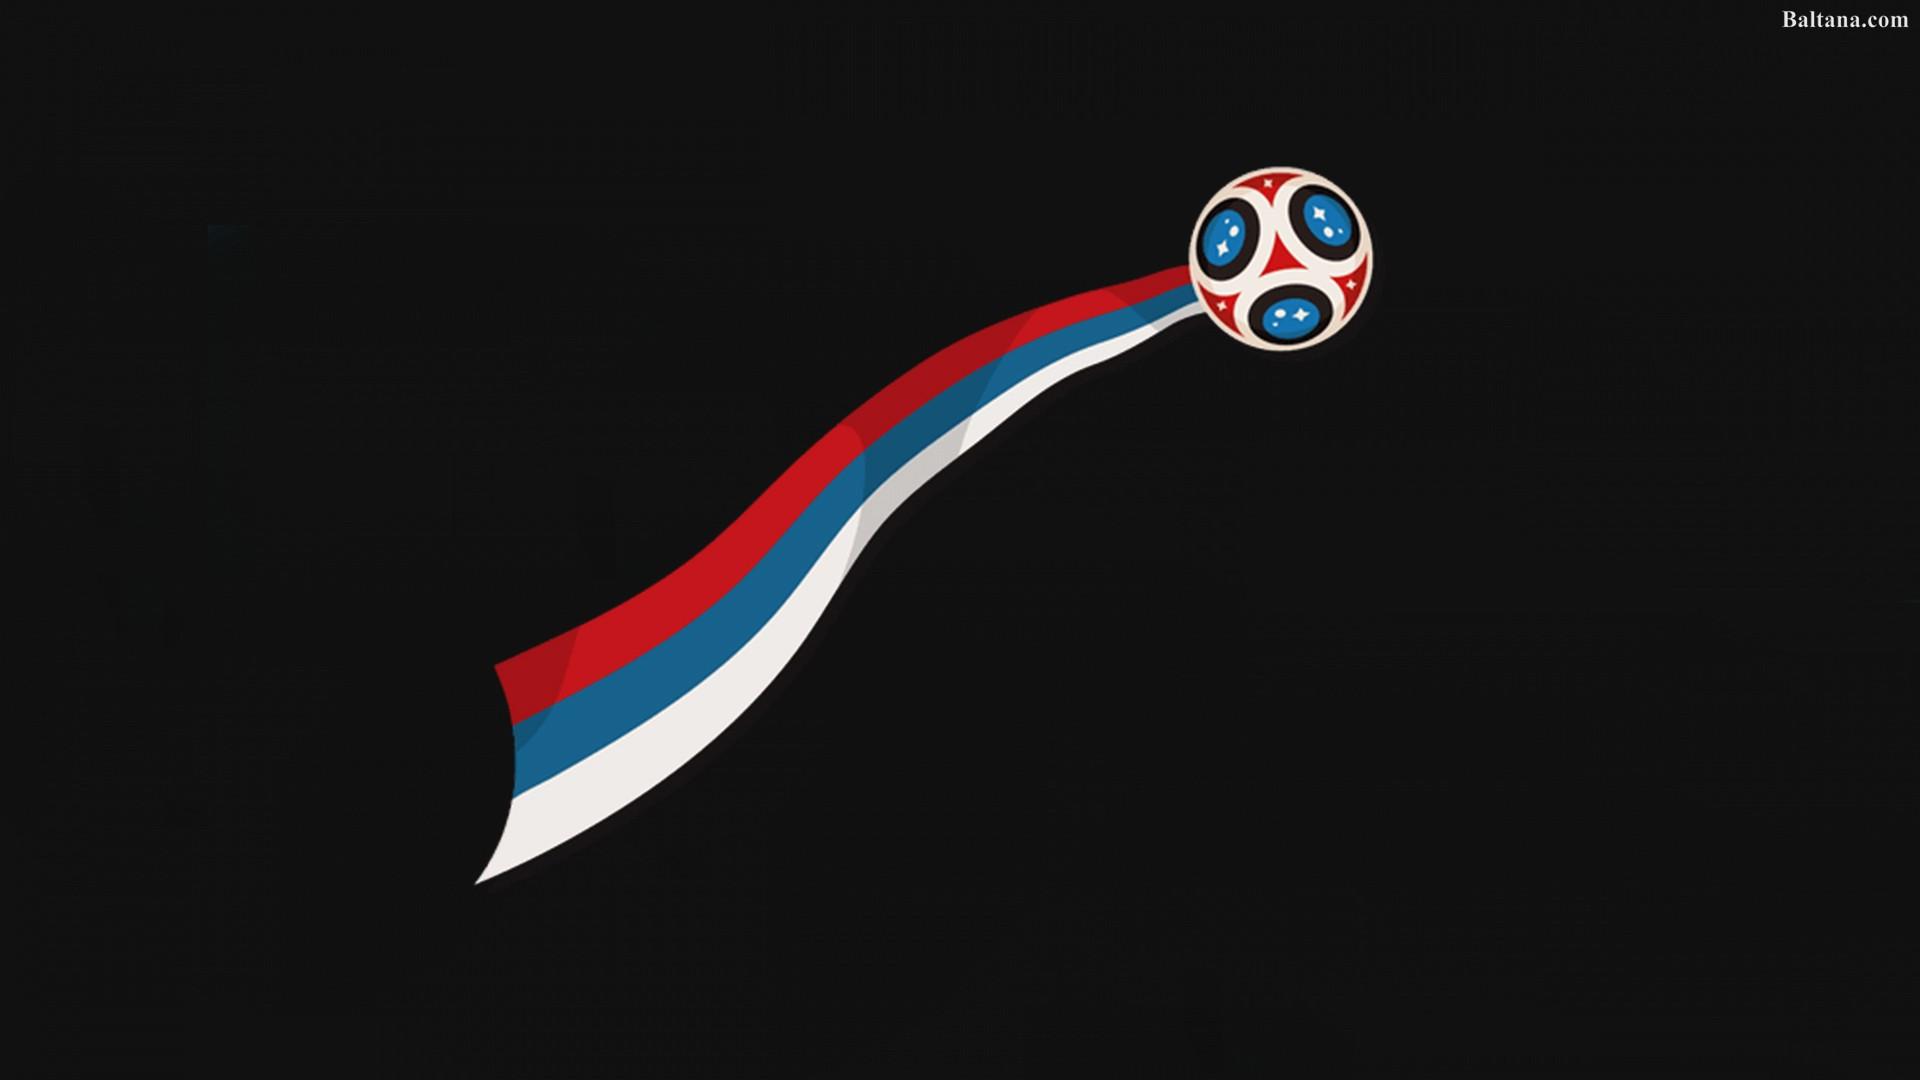 Free Download 2018 Fifa World Cup Wallpaper Hd 34011 Baltana